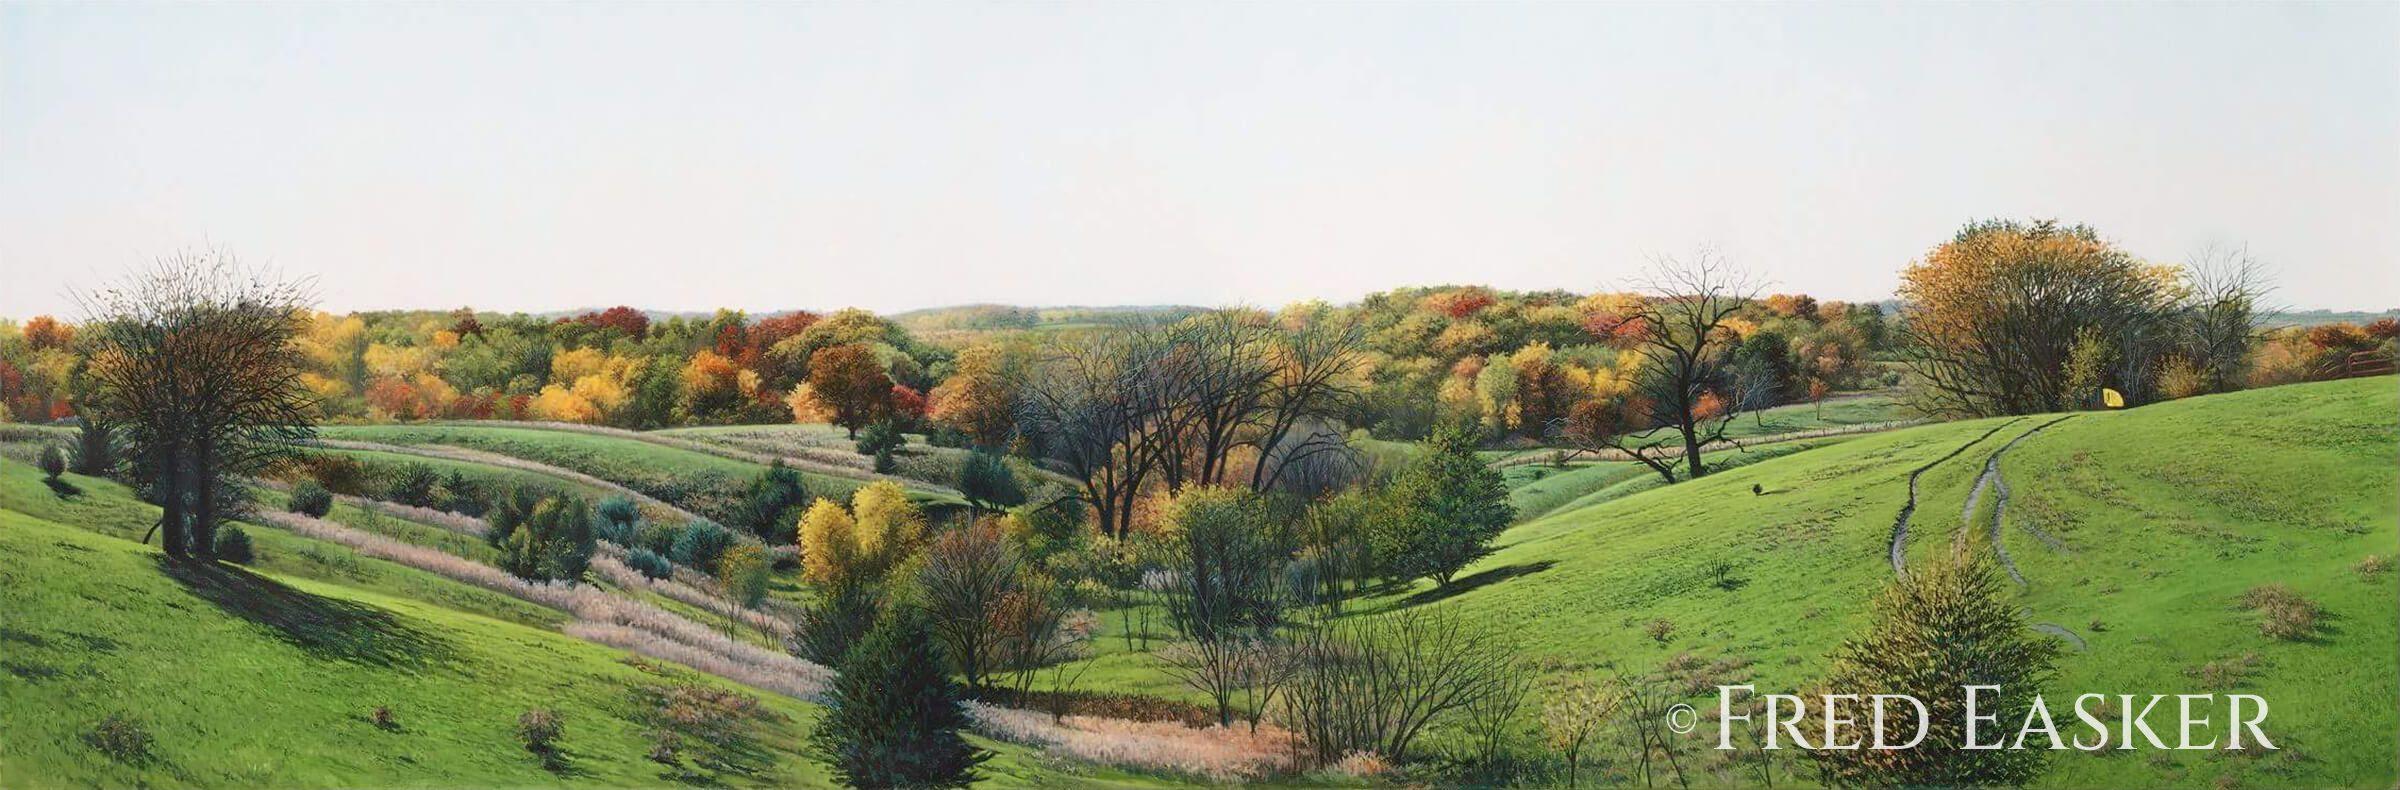 Autumn View Near Matsell by Fred Easker